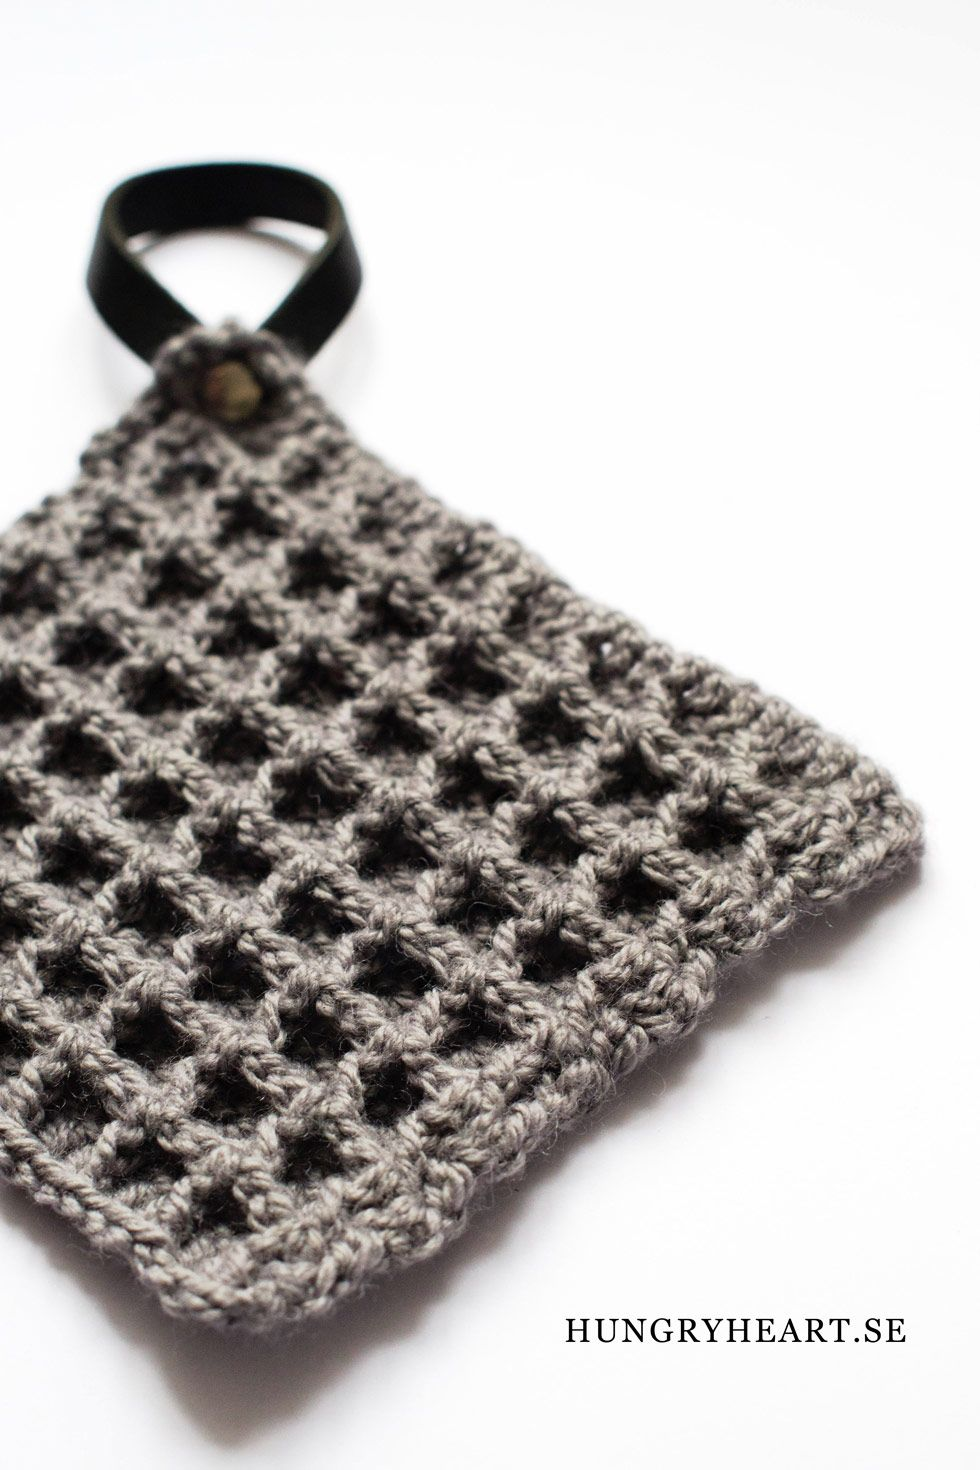 DIY Waffle Stitch Crochet Potholder | Hungry Heart | Art | Pinterest ...